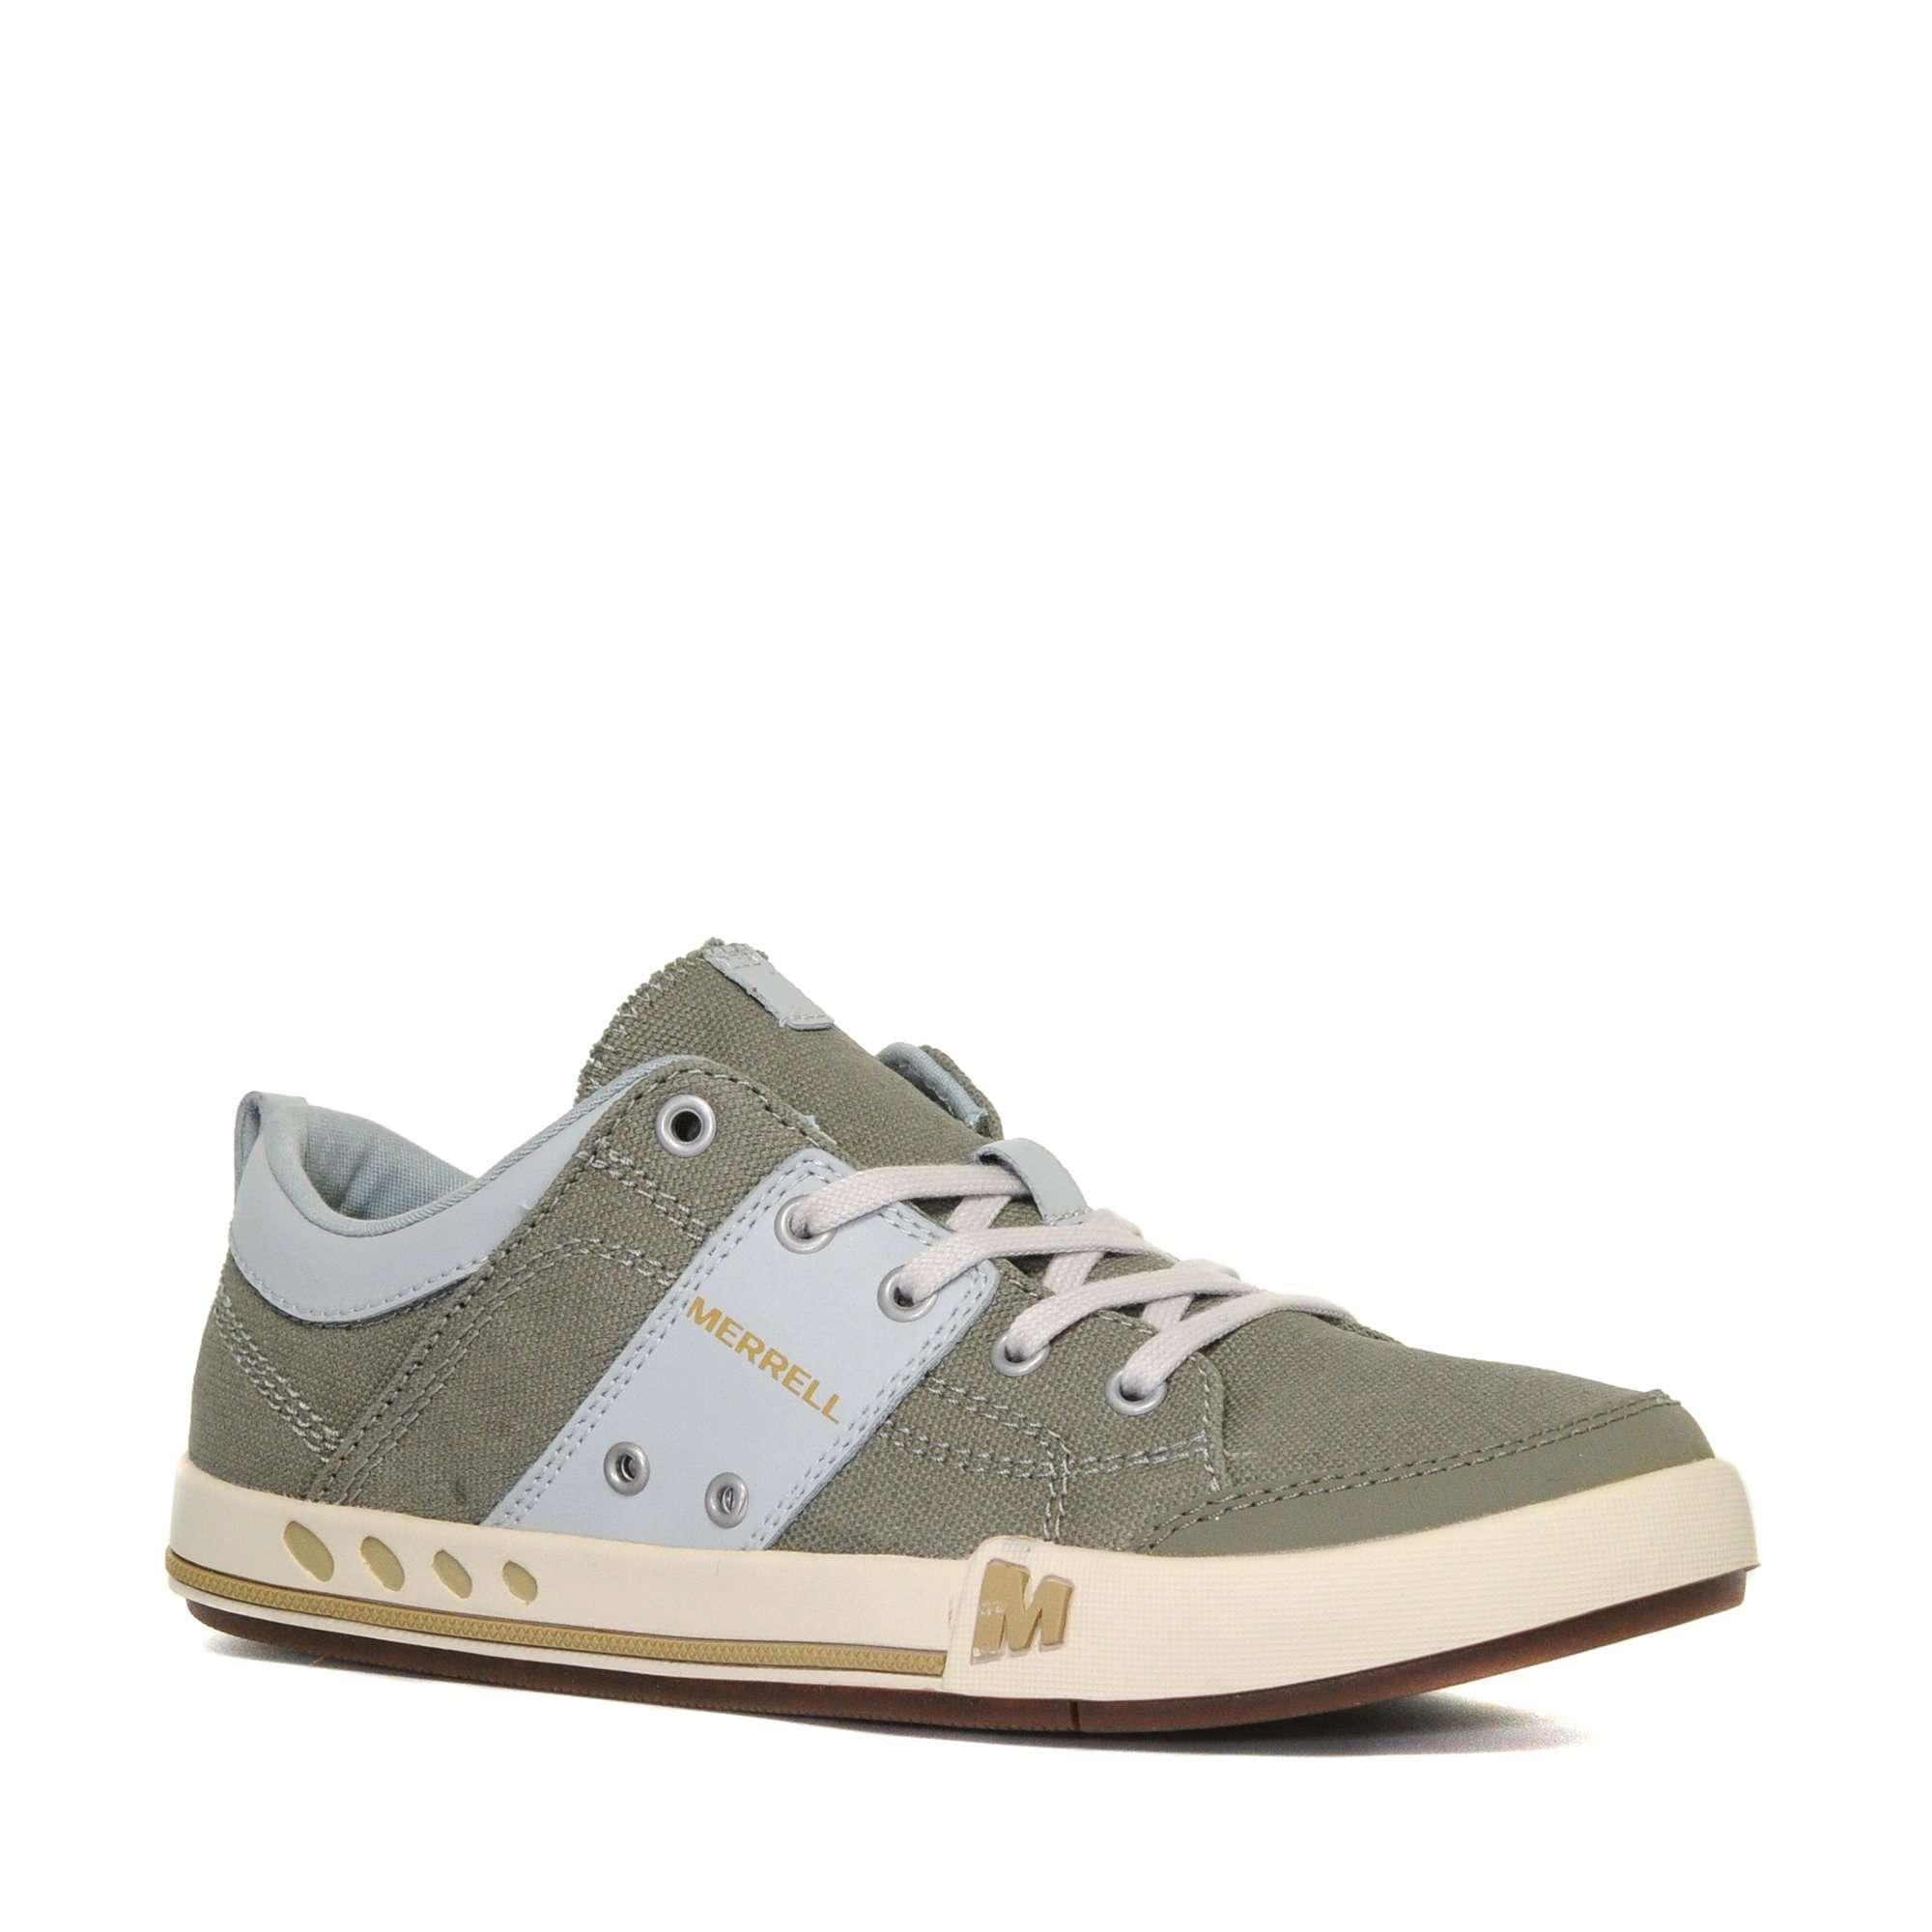 MERRELL Women's Rant Shoe